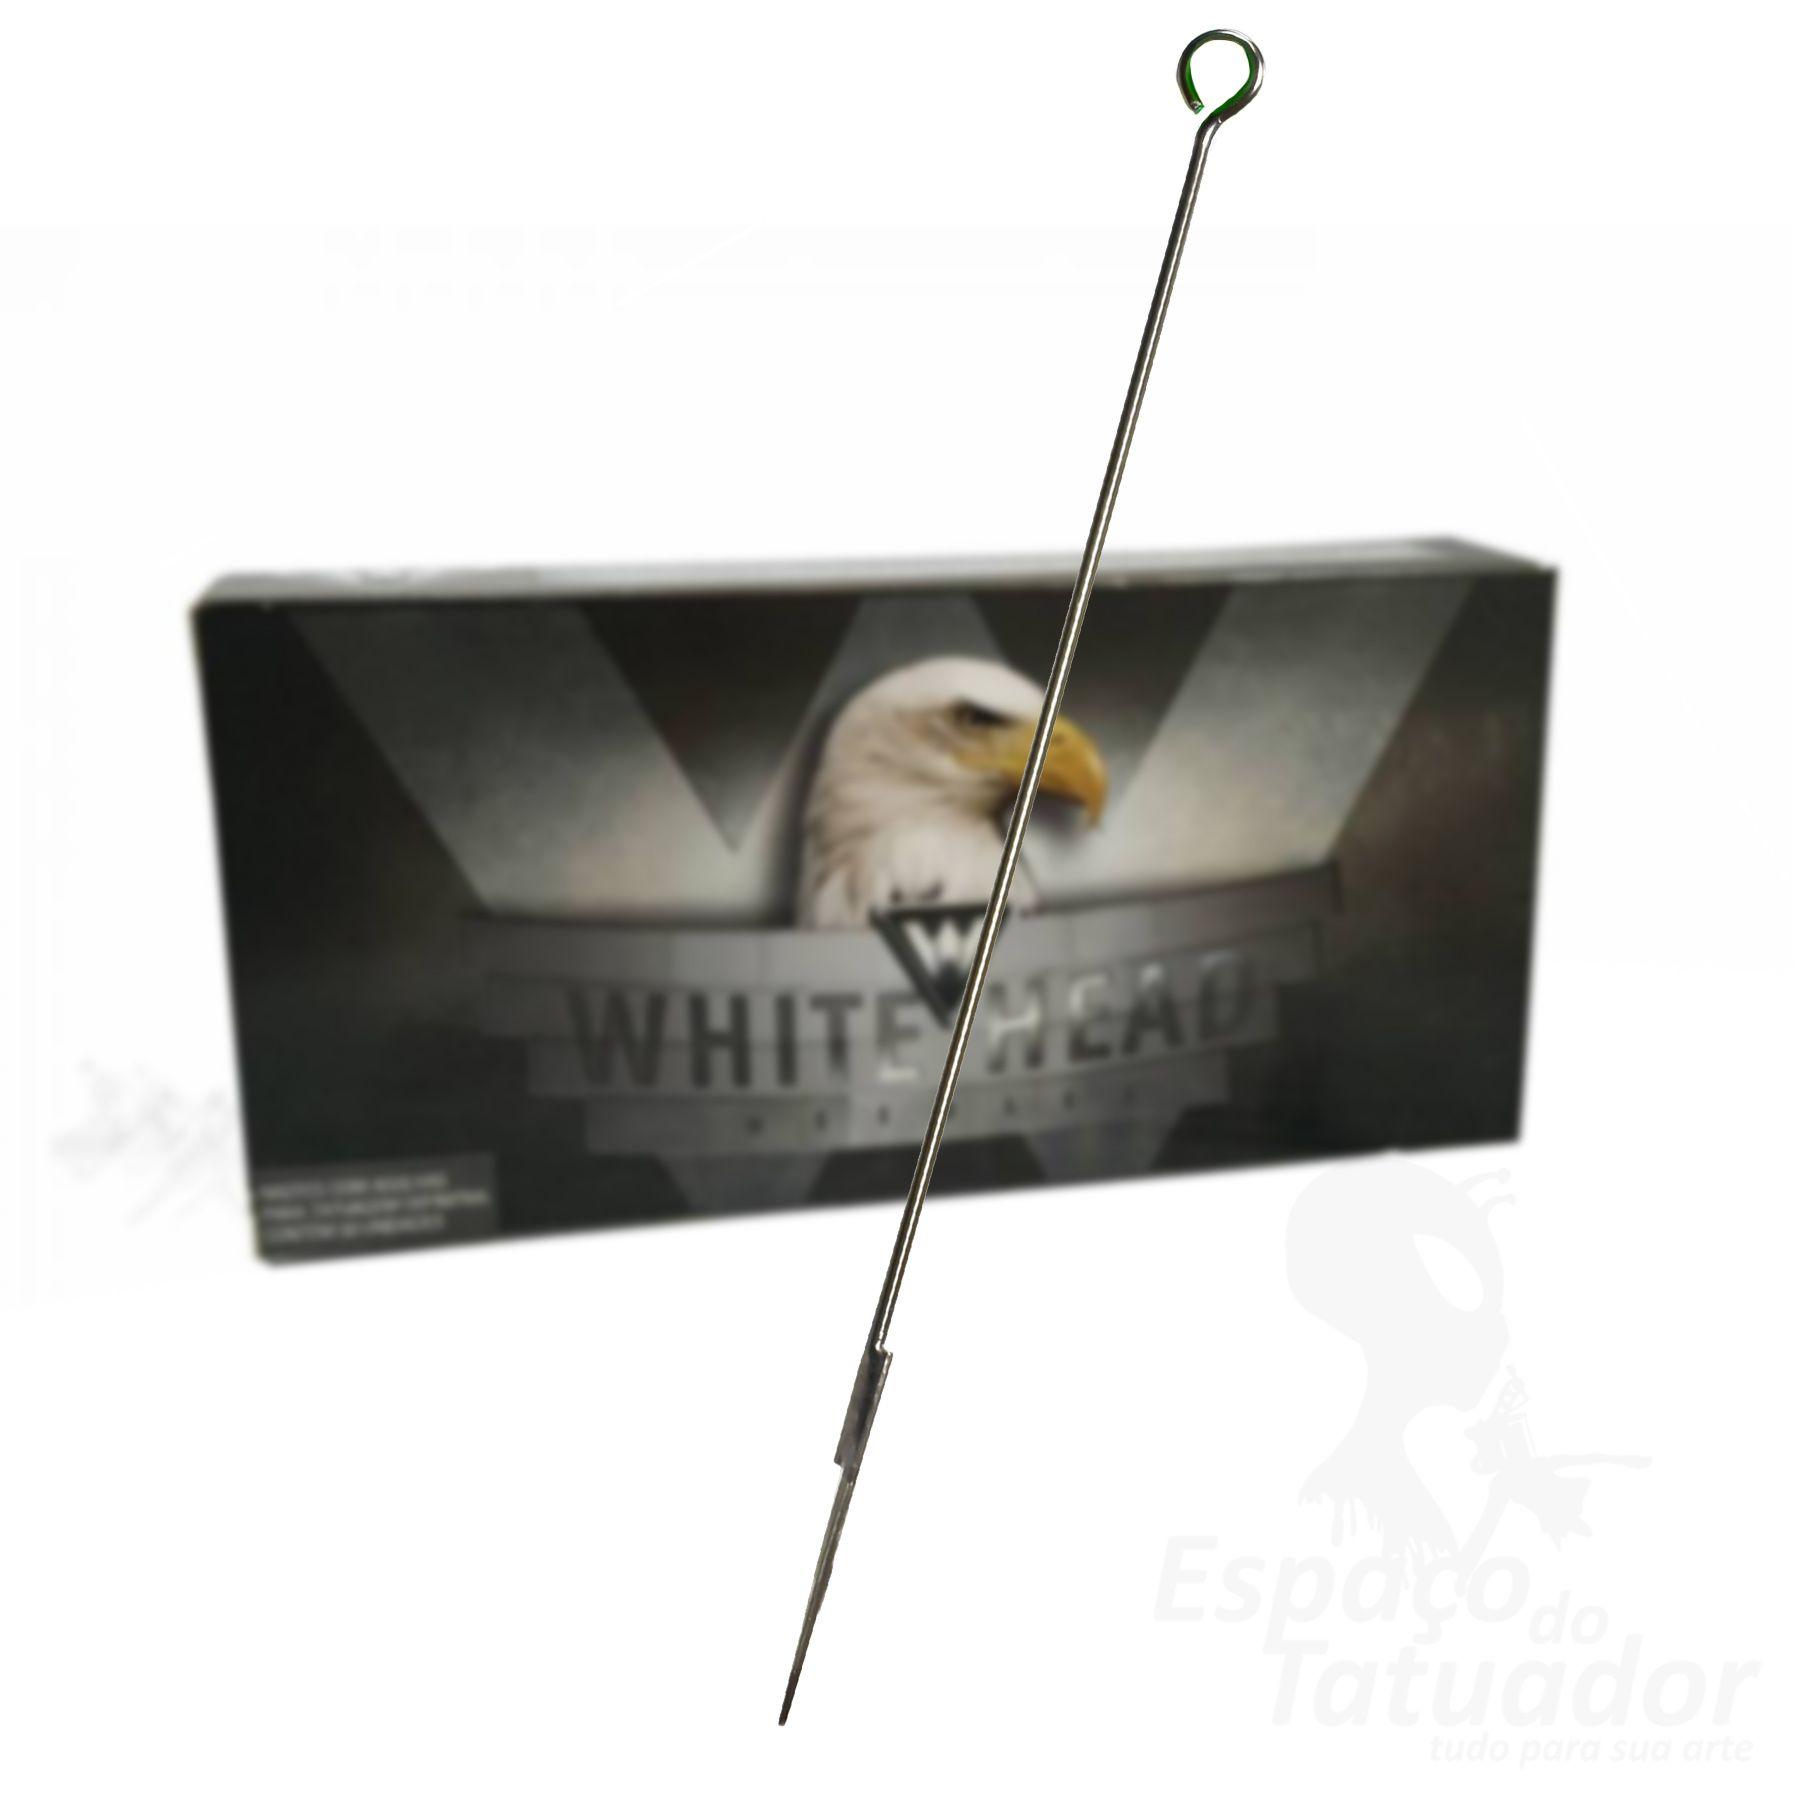 Agulha White Head - RL 1003 - Caixa com 50 unidades